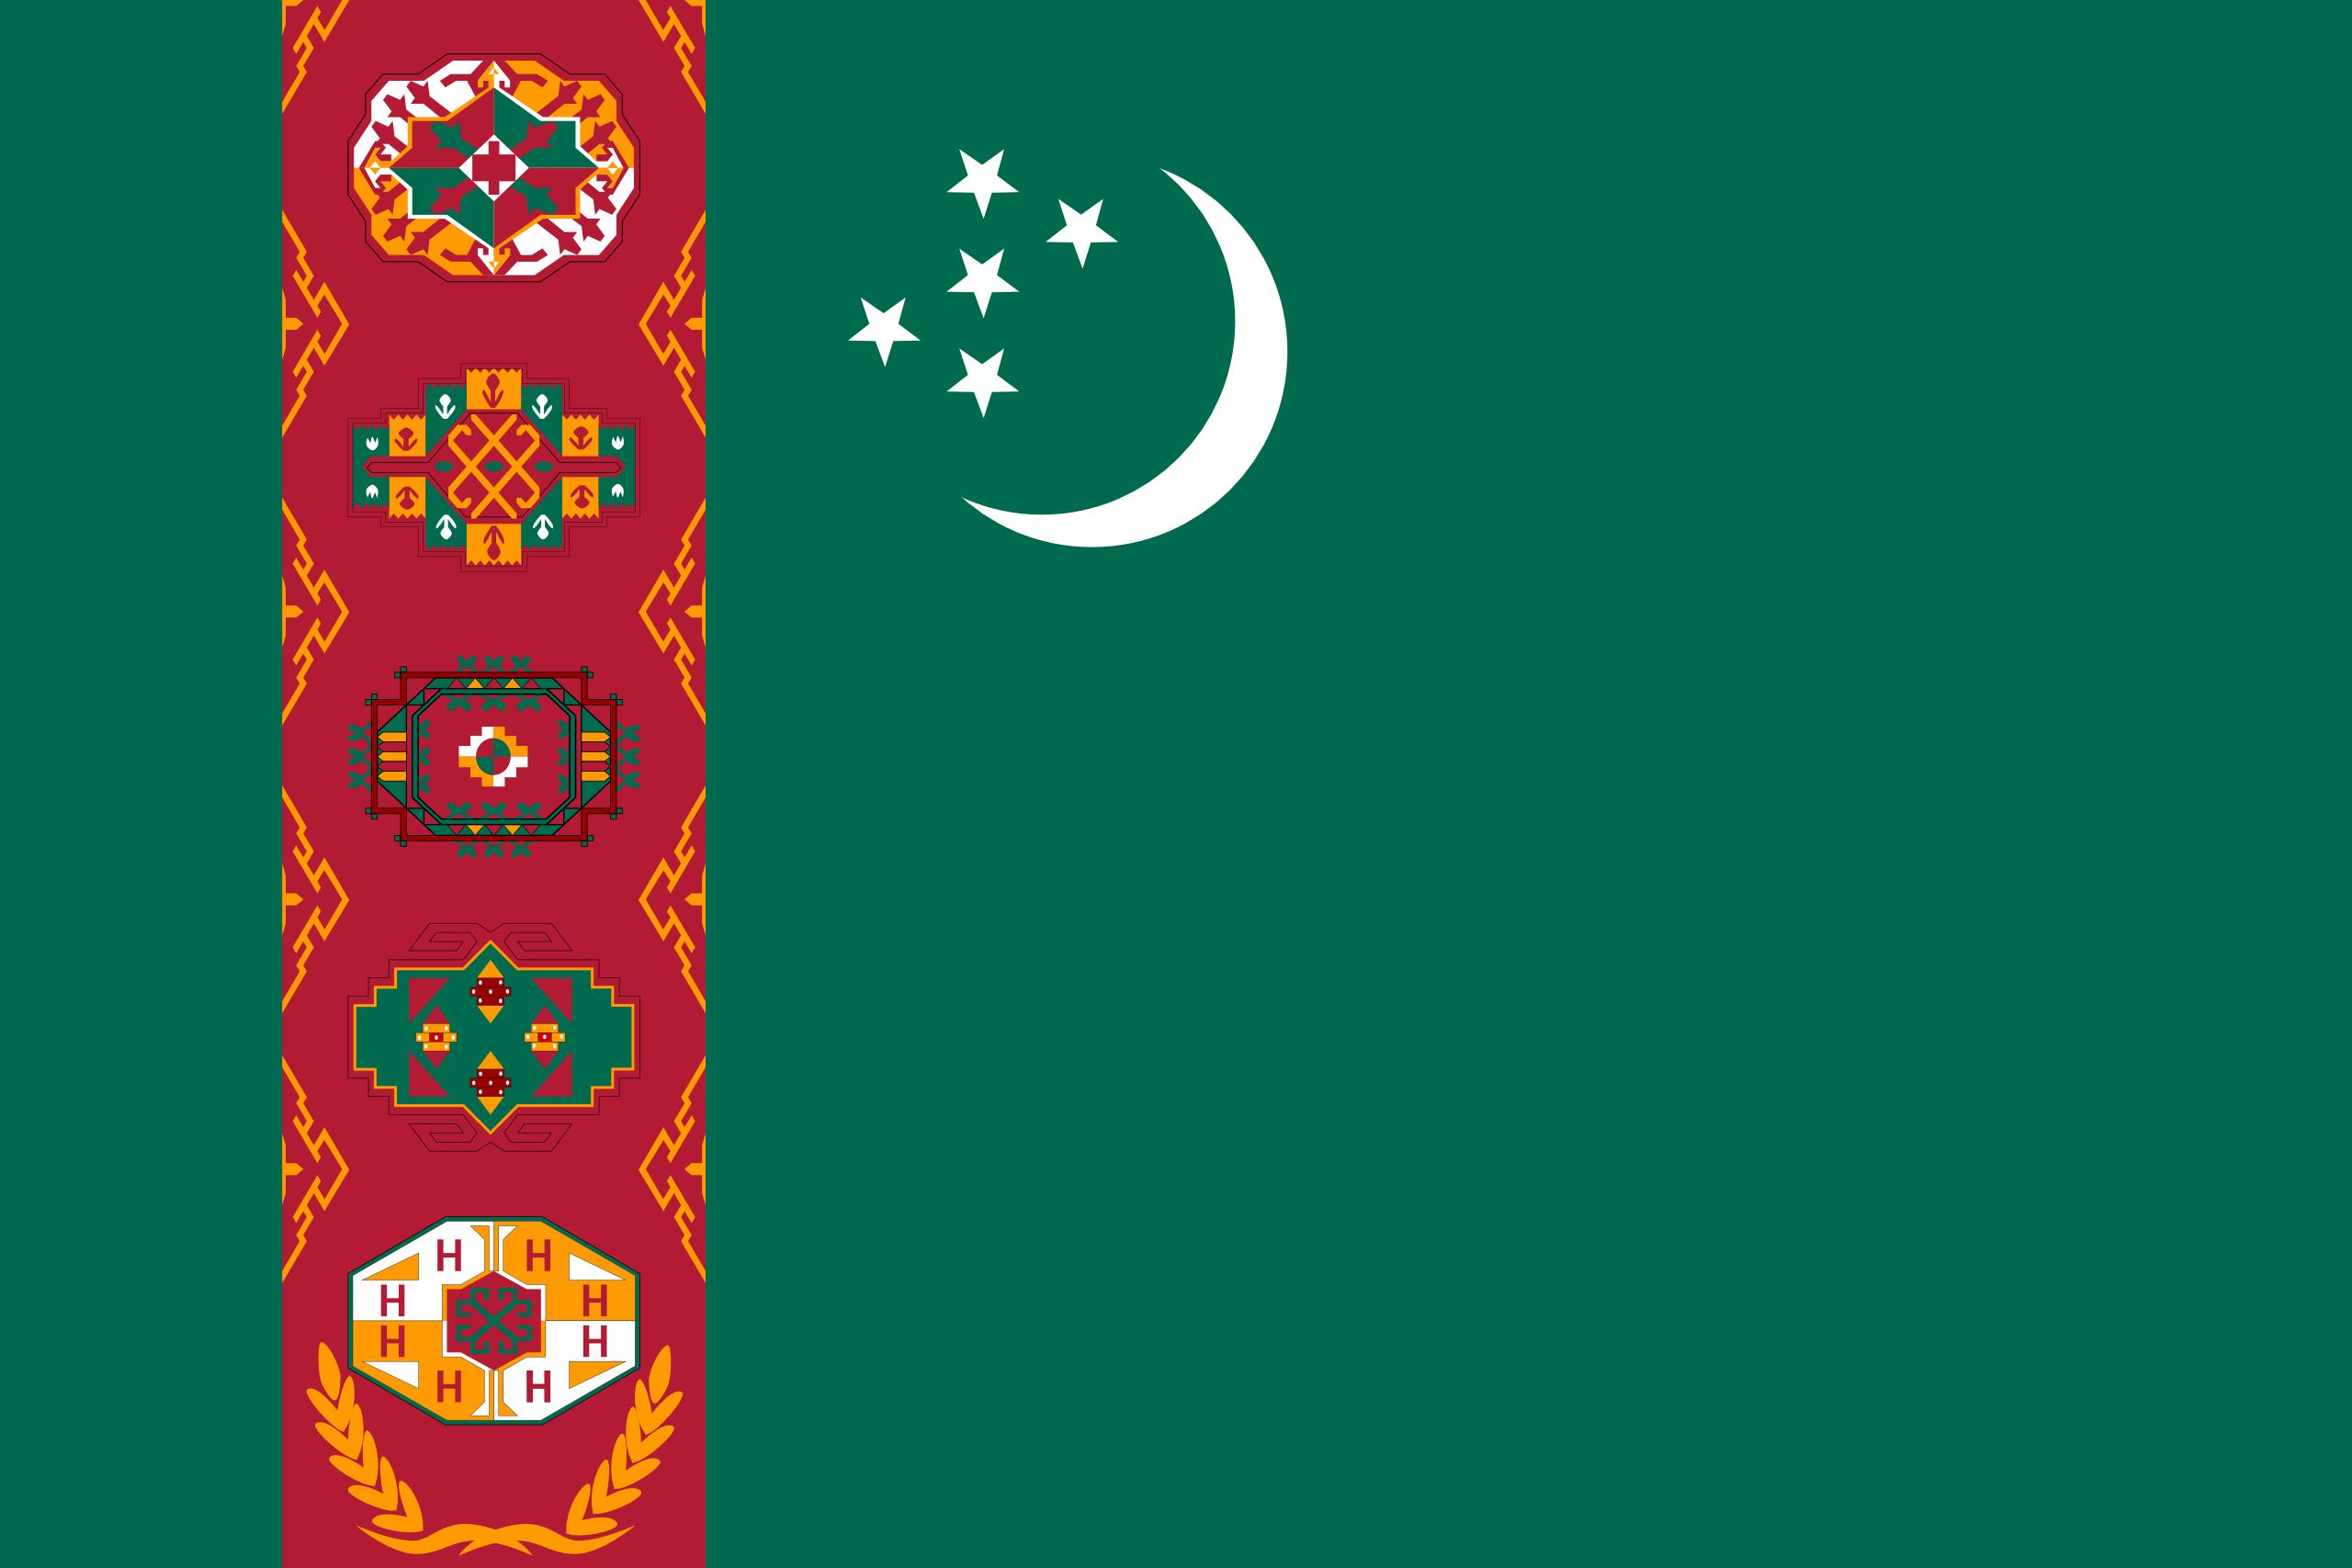 turkmenistán, Land, Emblem, Logo, Symbol - Wallpaper HD - Prof.-falken.com